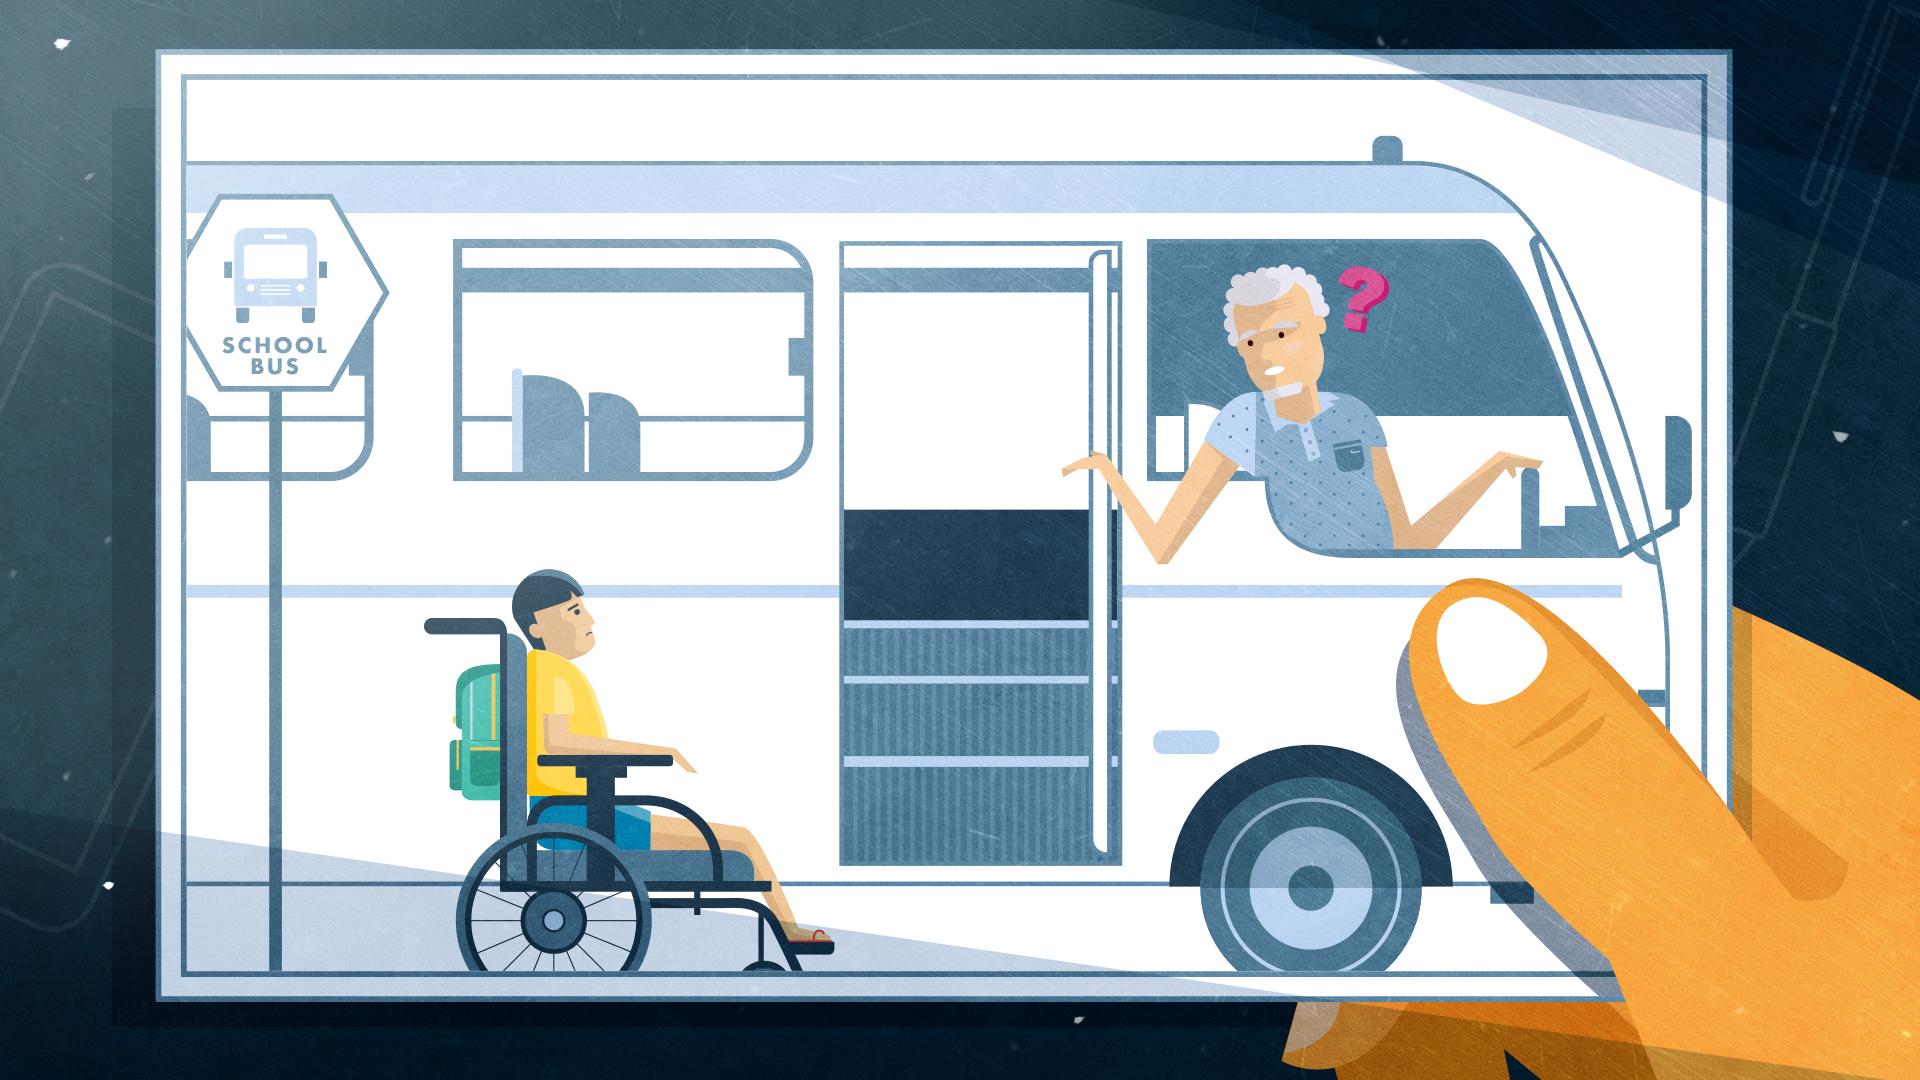 Frame 11 (School Bus).jpg